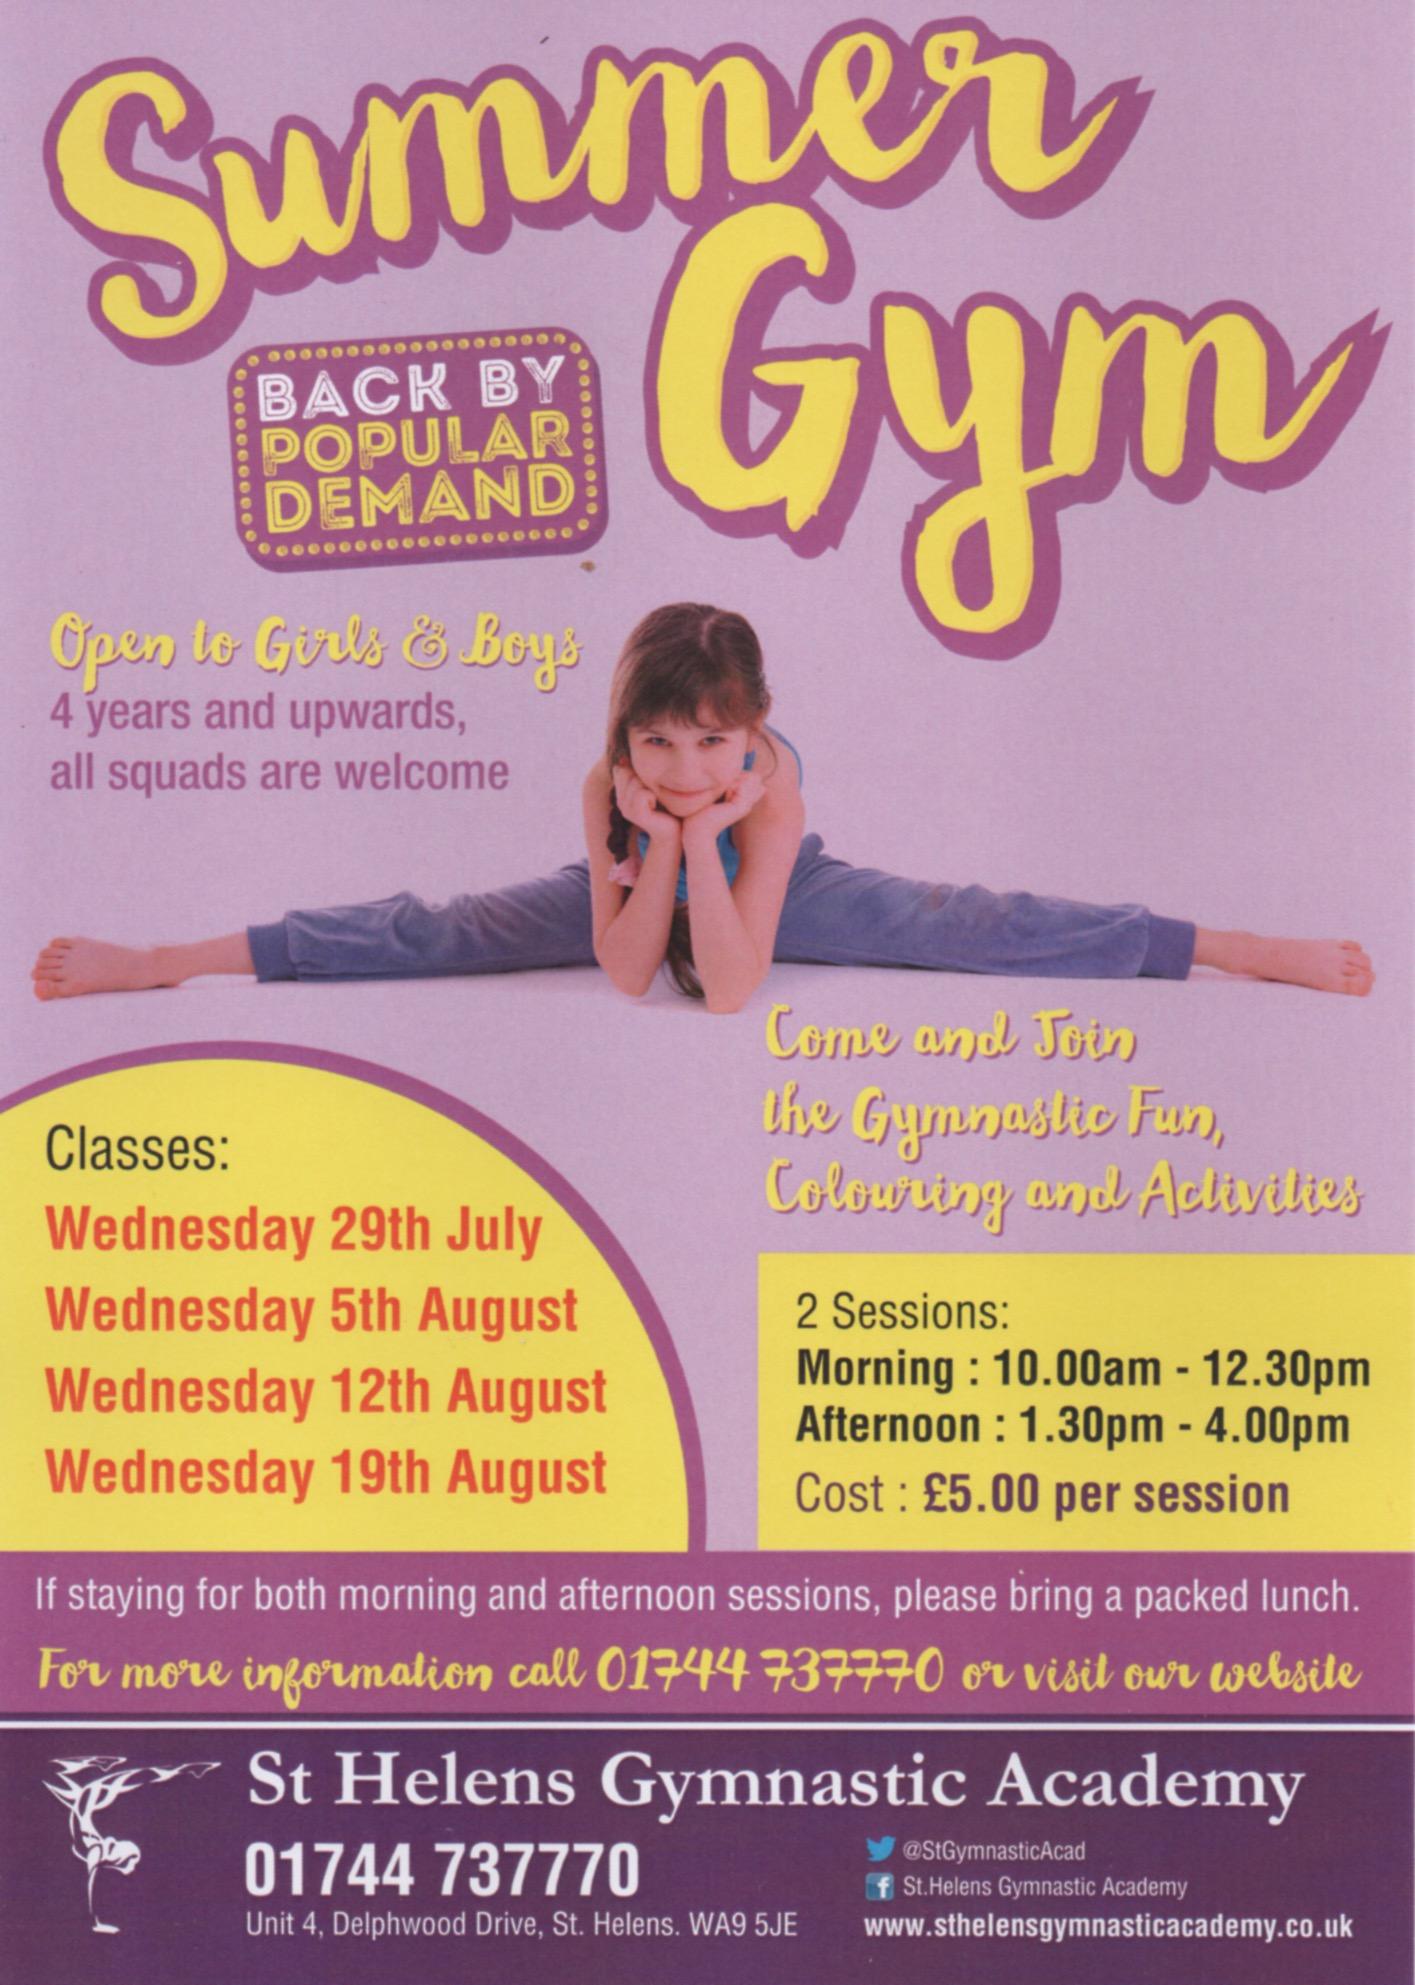 Summer Gym at St.Helens Gymnastic Academy